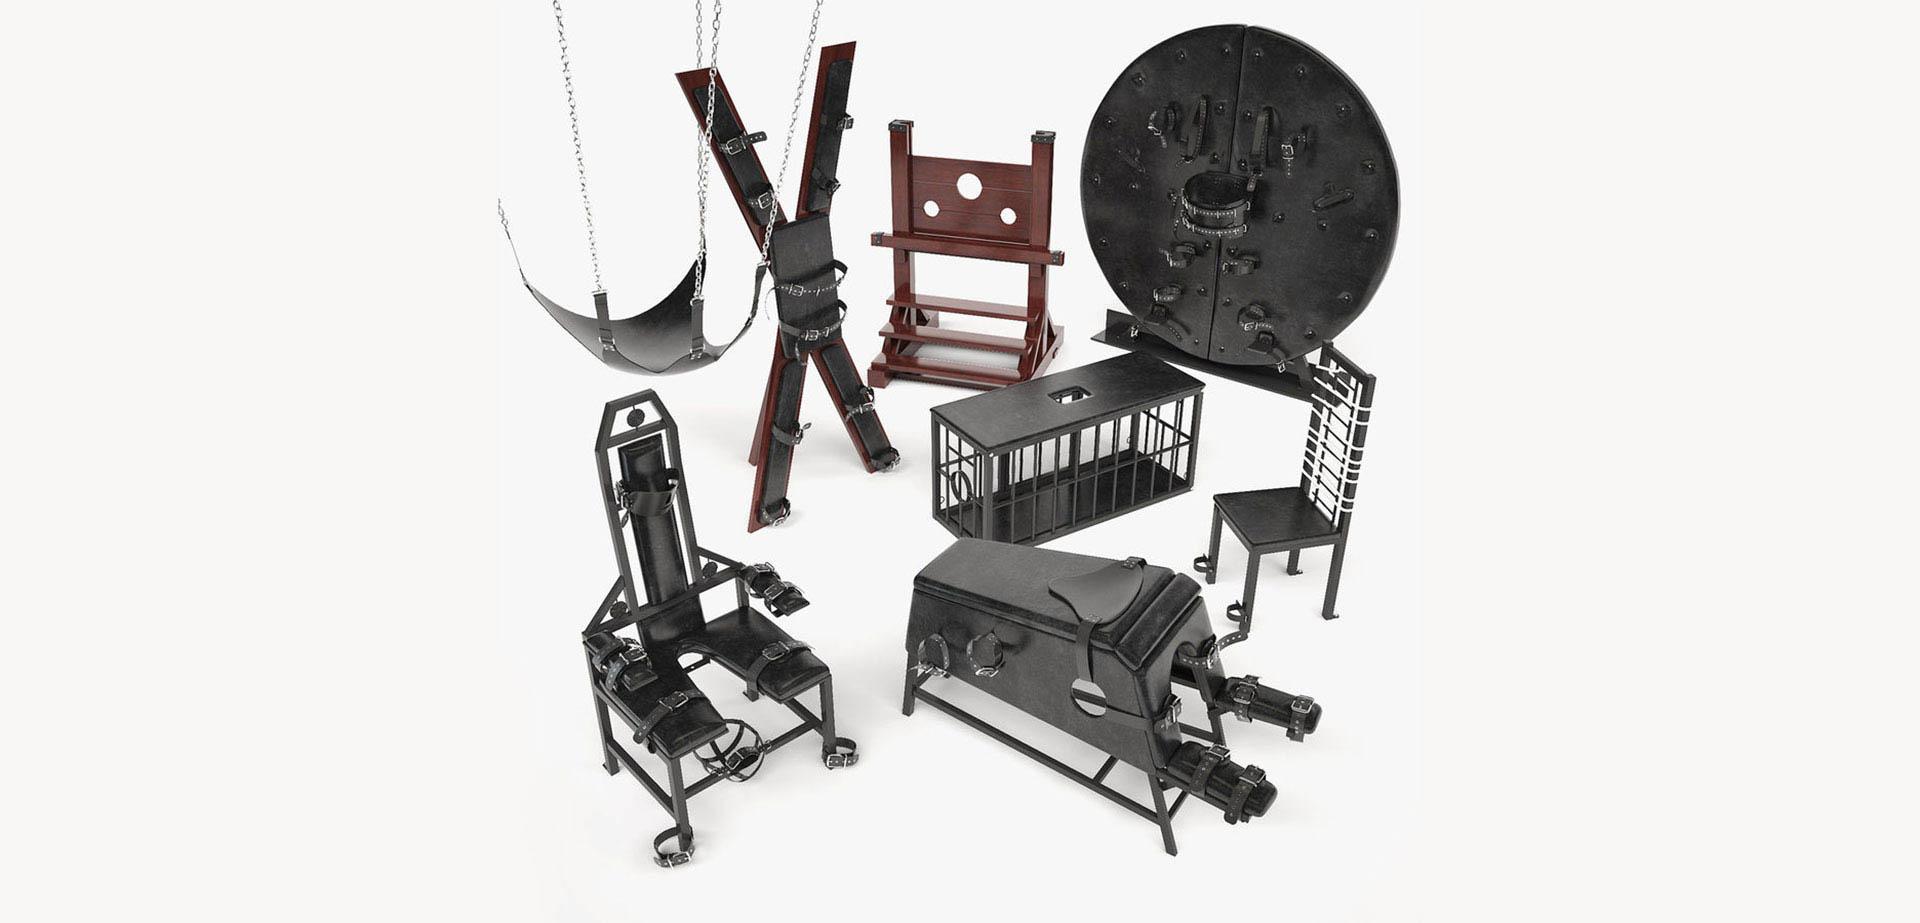 Muebles de esclavitud.